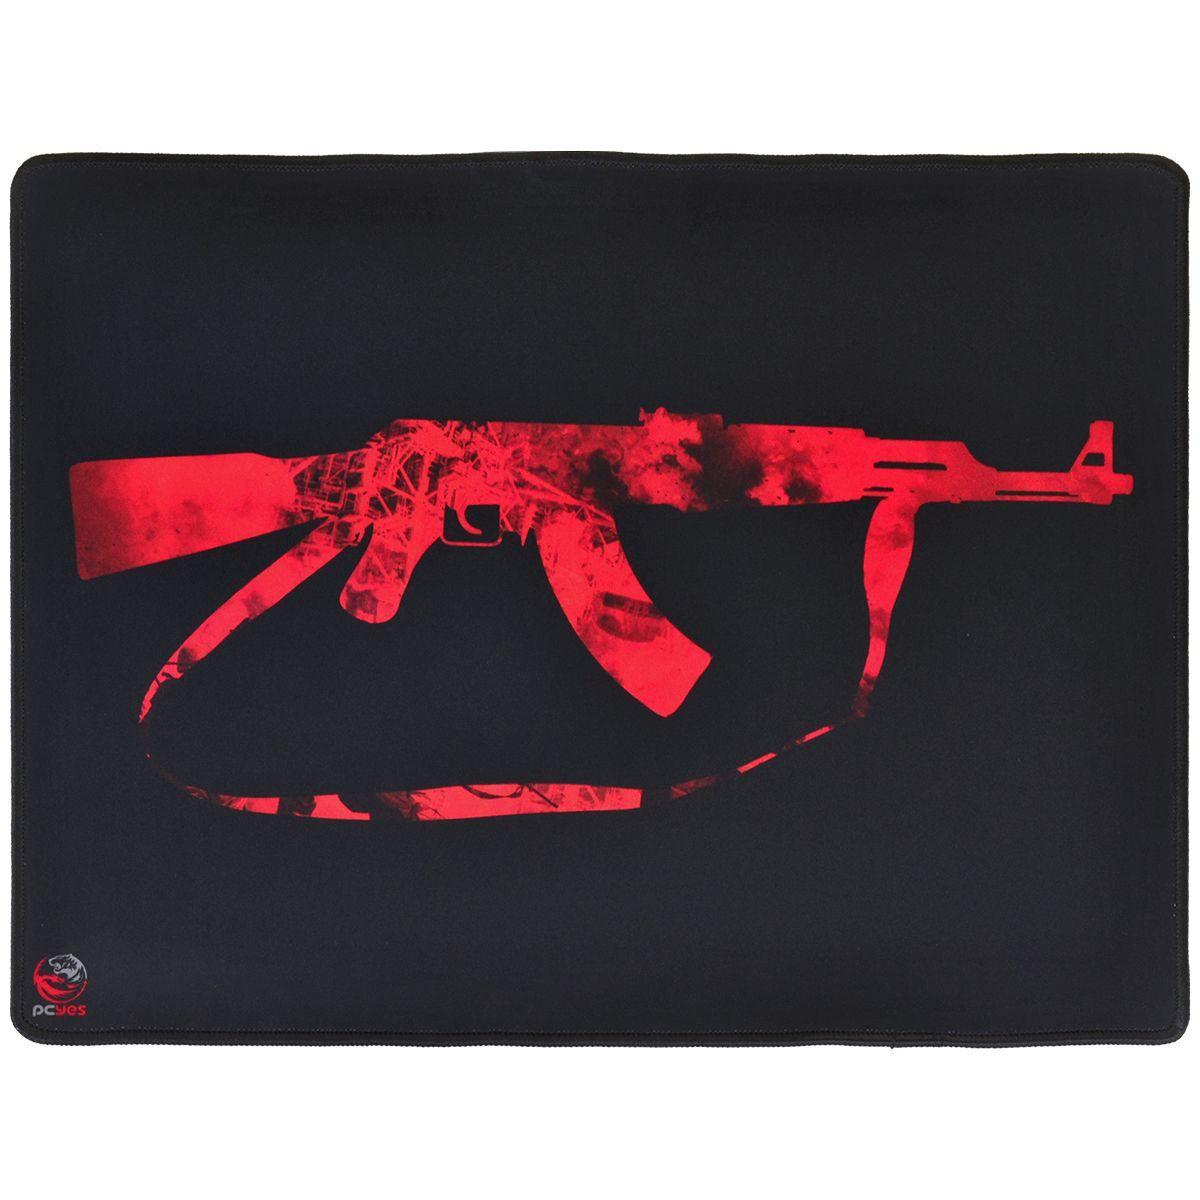 Mouse Pad FPS AK47 500X400mm FA50X40 28985 - Pcyes